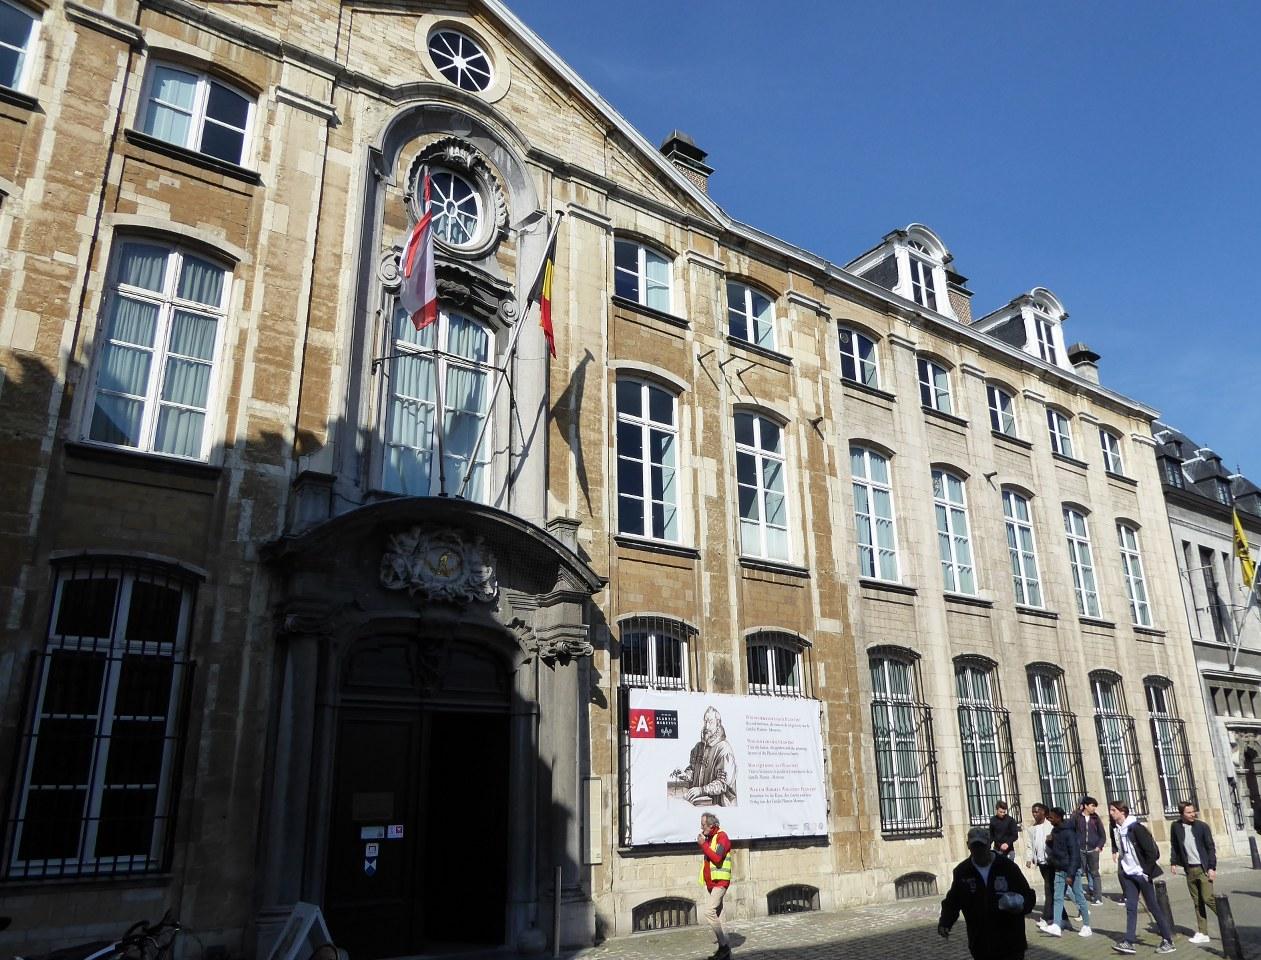 Plantin-Moretus Museum Antwerp